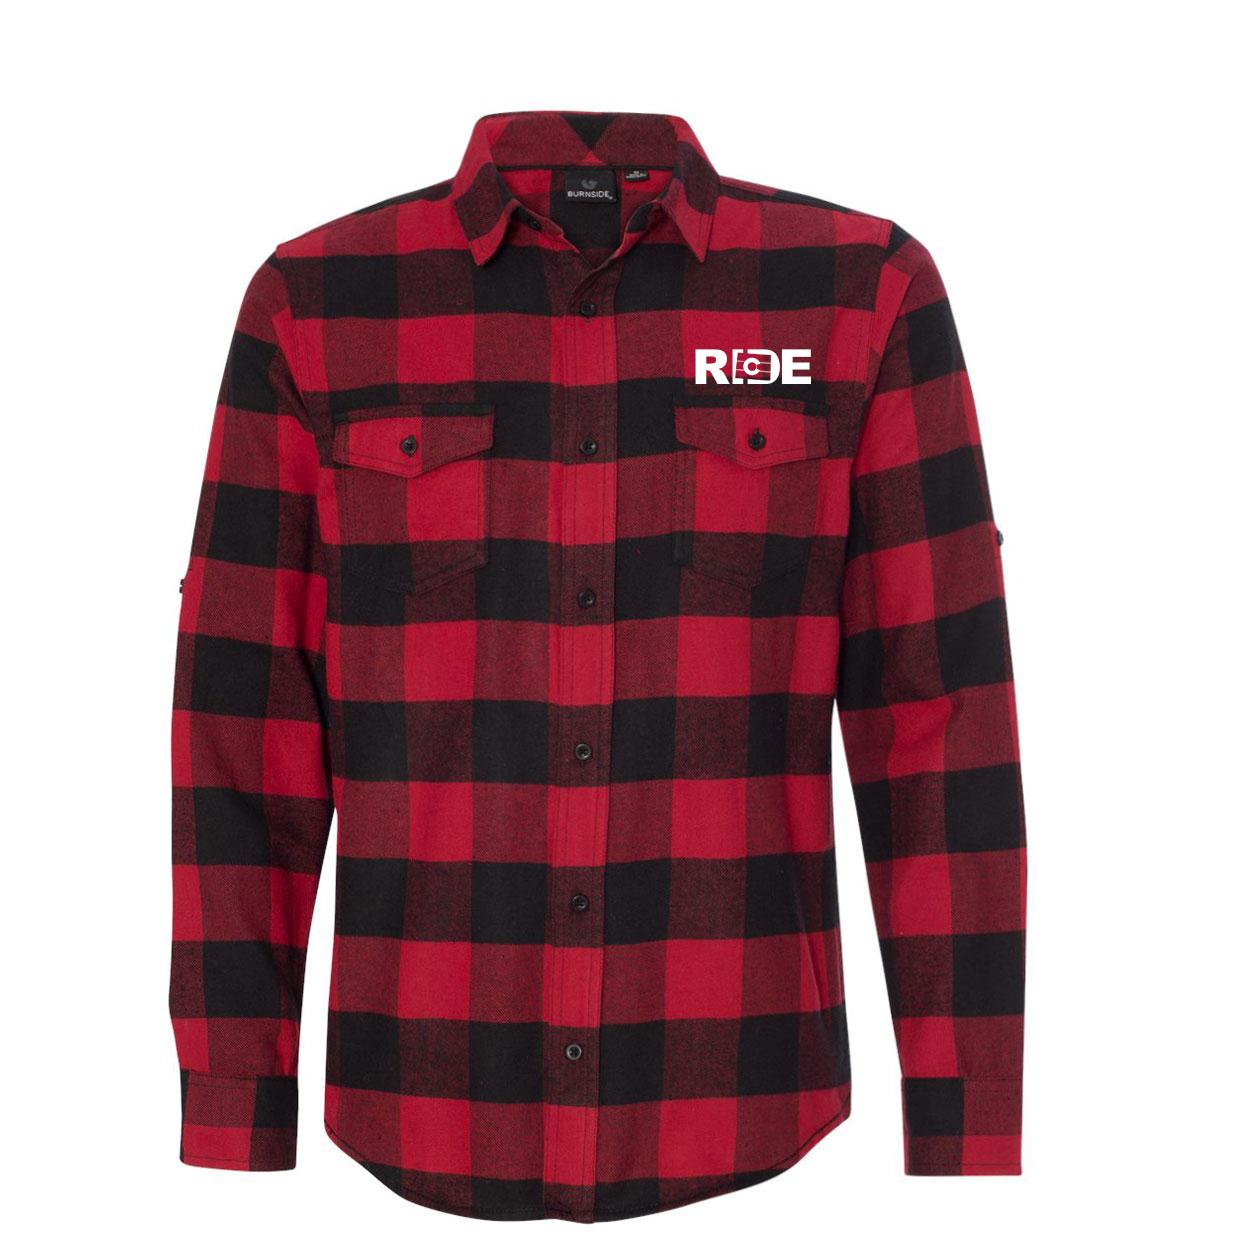 Ride Colorado Classic Unisex Long Sleeve Flannel Shirt Red/Black Buffalo (White Logo)